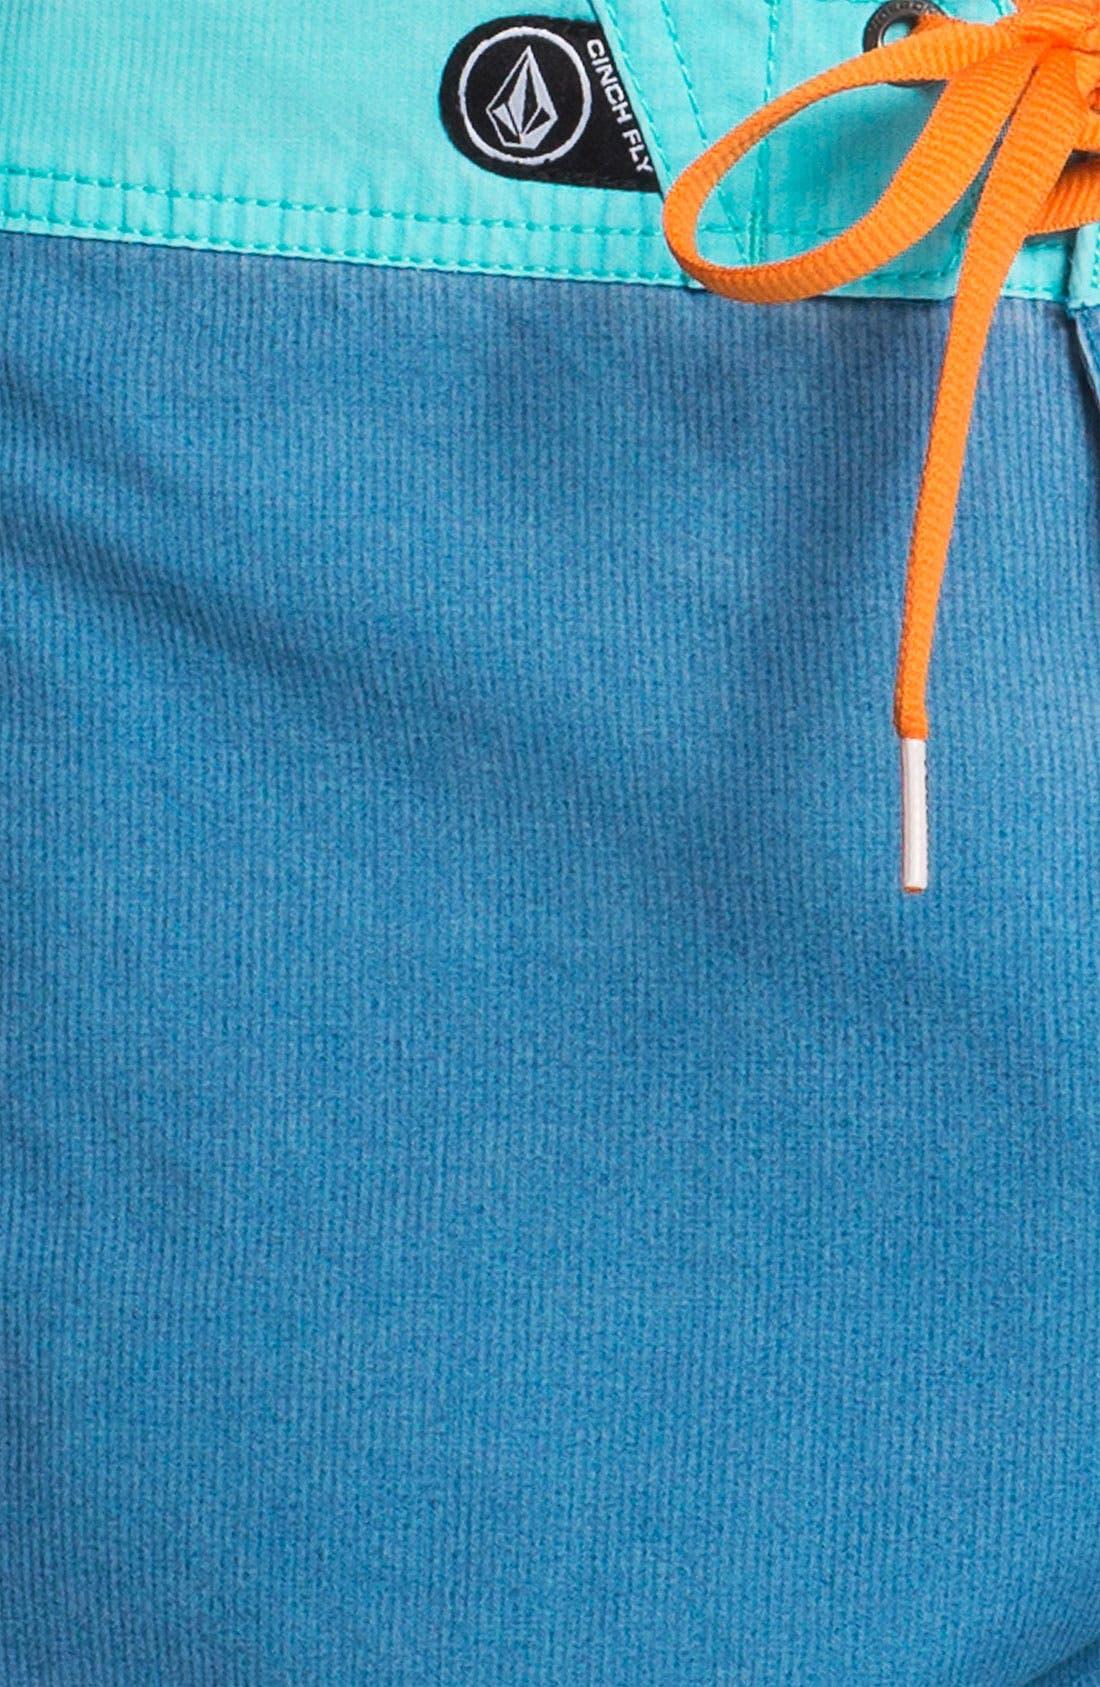 Alternate Image 3  - Volcom 'Beach Road 18' Board Shorts